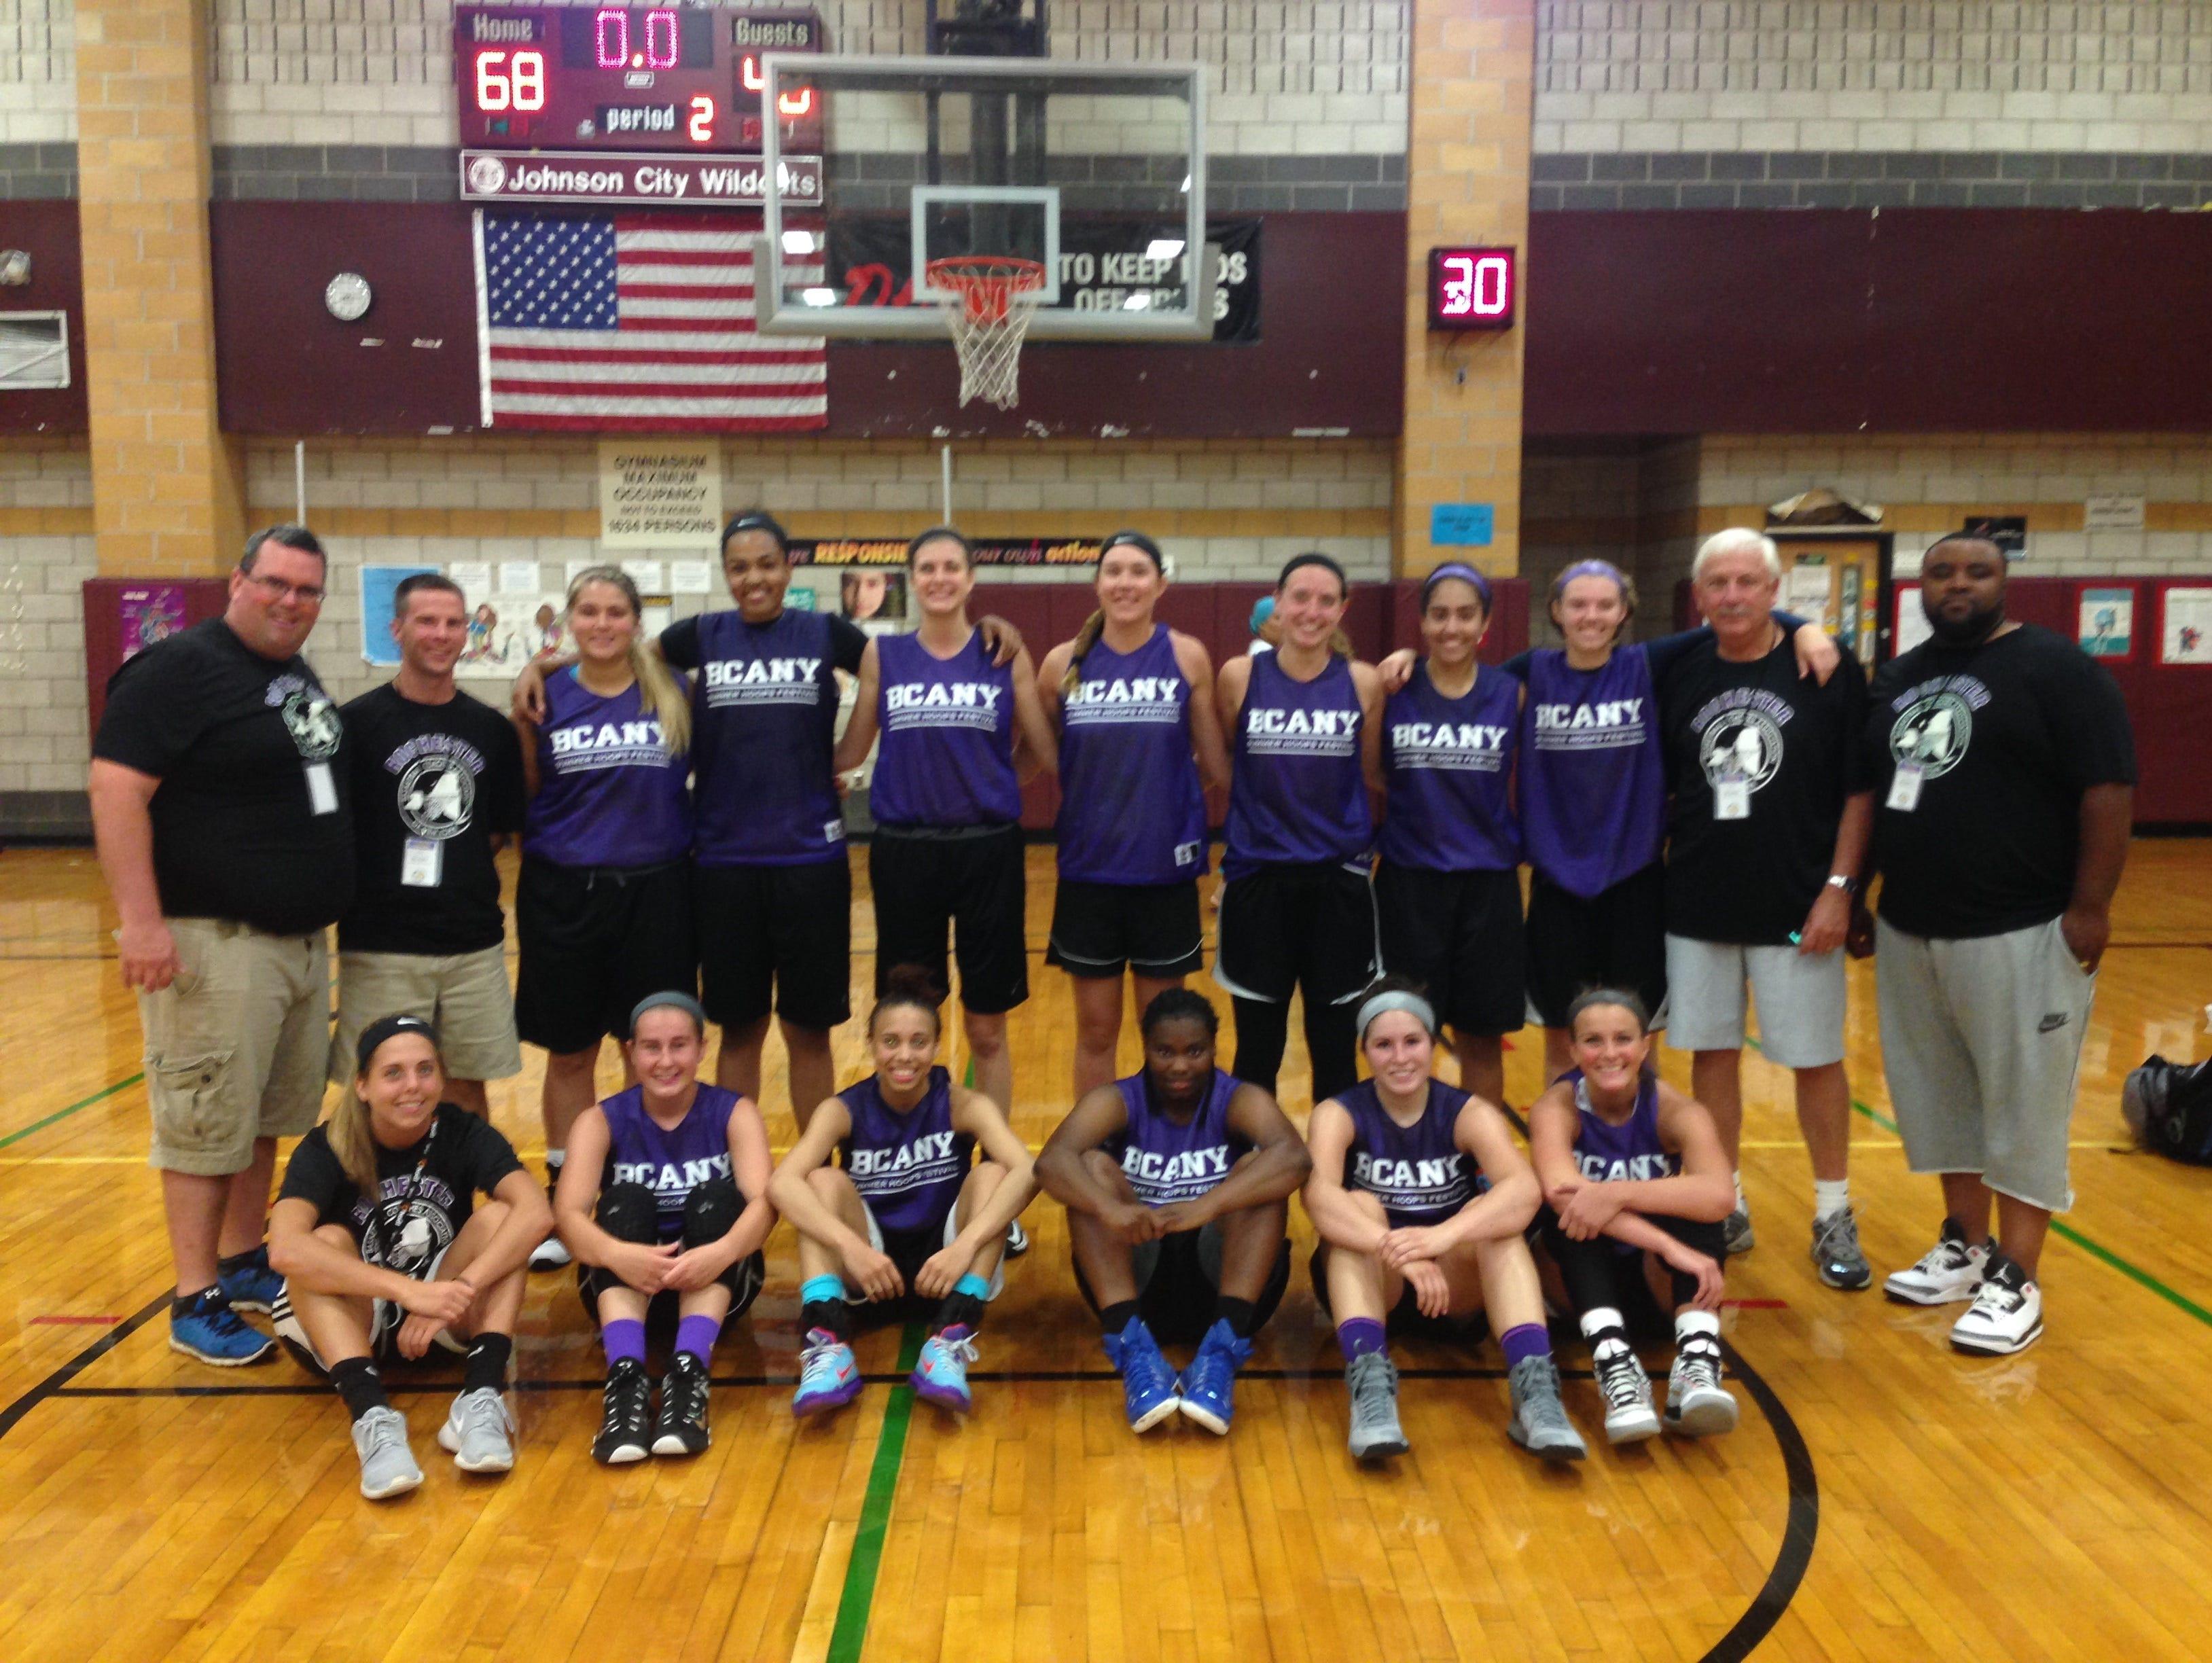 2015 Rochester girls basketball team, silver-medalist at Basketball Coaches Association of New York Summer Hoops Festival in Johnson City.